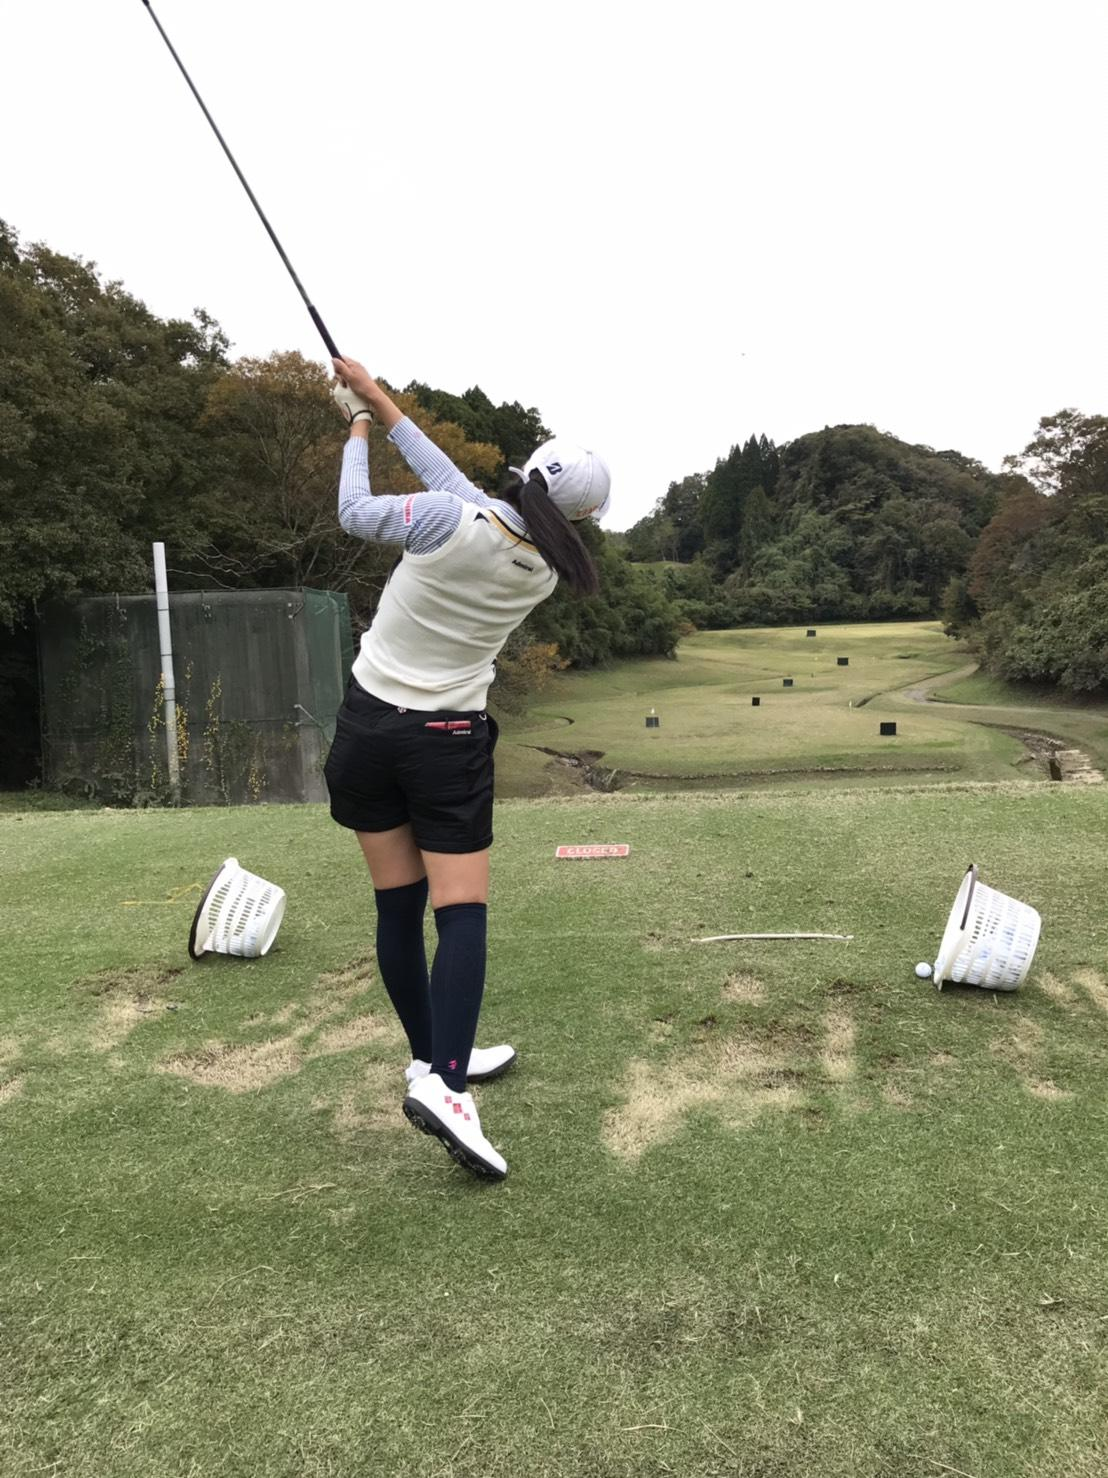 https://www.bs-golf.com/pro/9aada7ca3f4e886f38b918007d45b66e661778e5.JPG